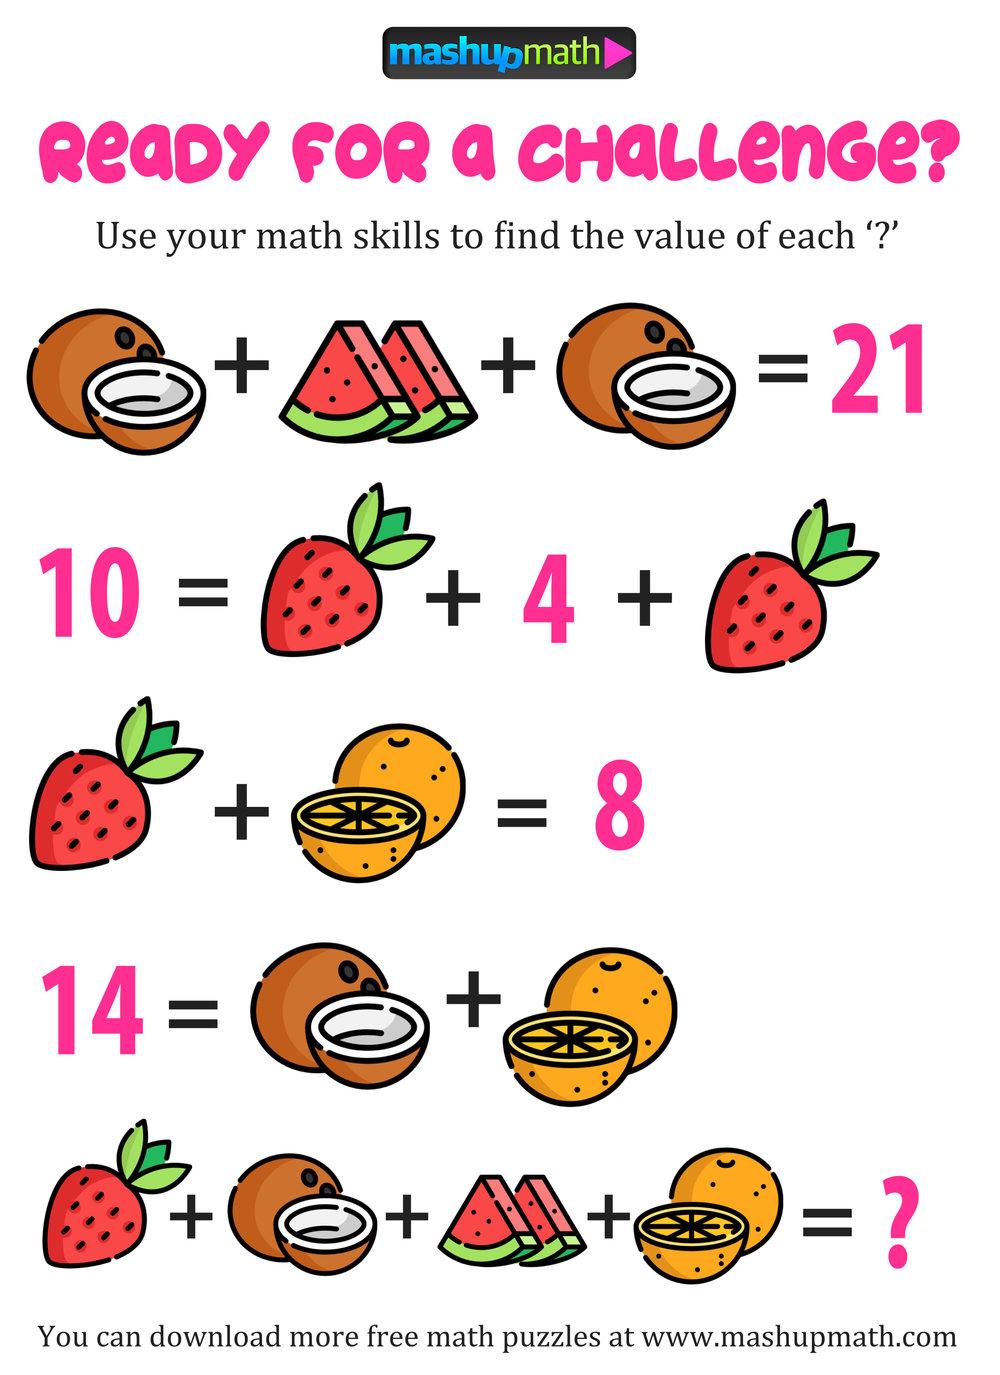 Free Math Puzzles — Mashup Math - Free Printable Math Puzzles